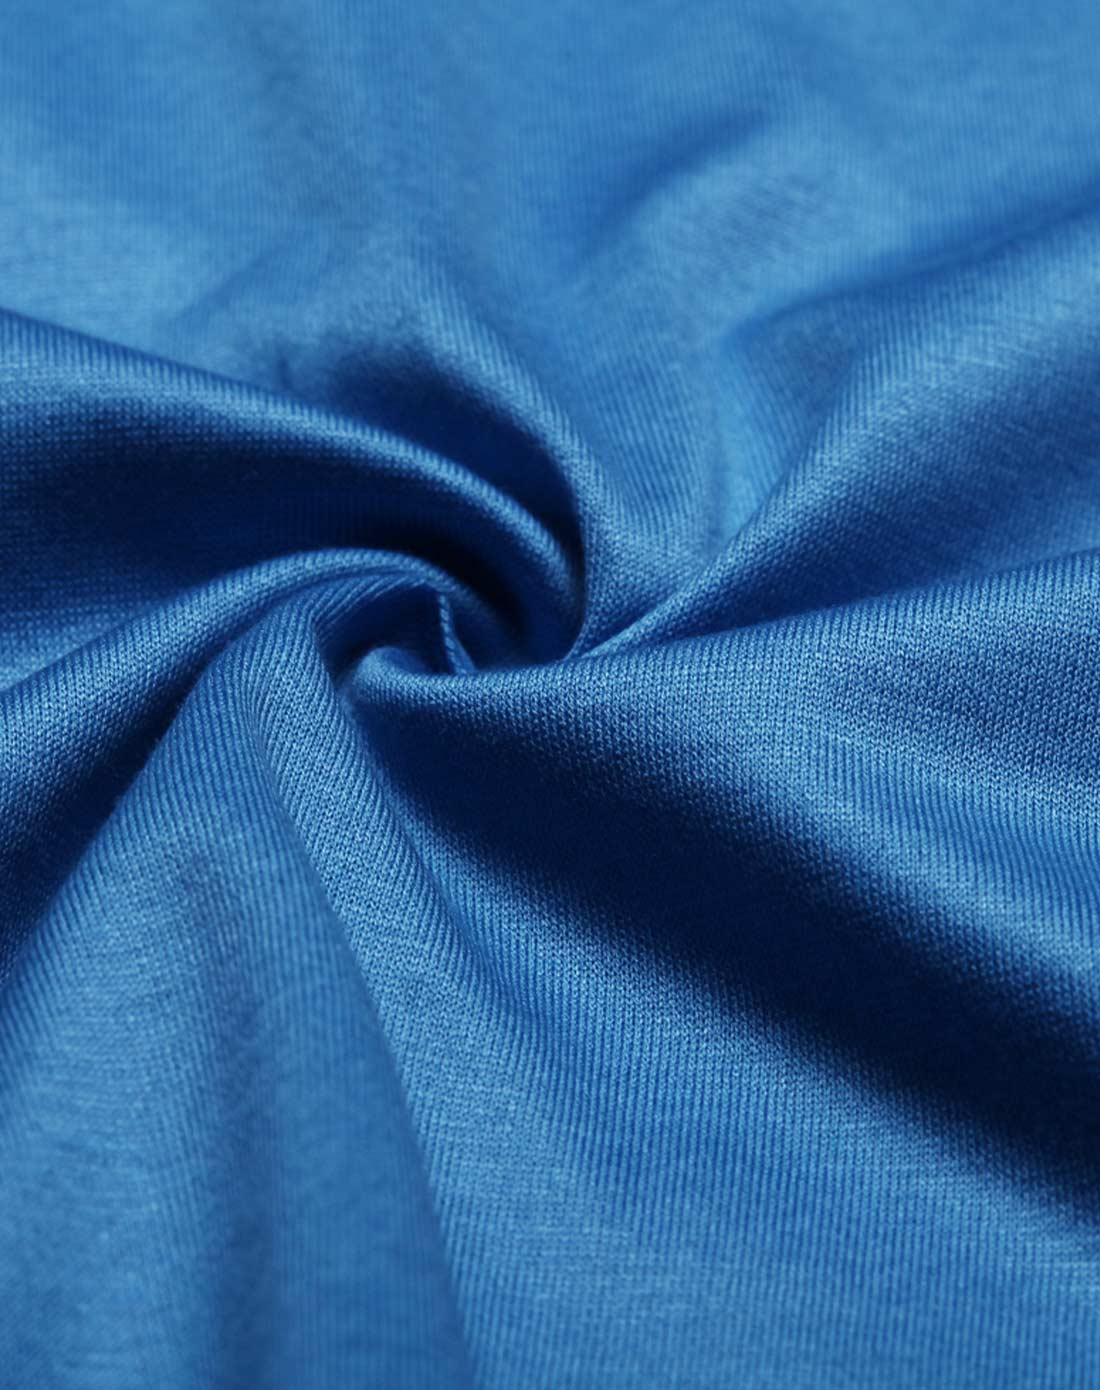 cncn淺藍色簡約清新短袖t恤ntby2610l10